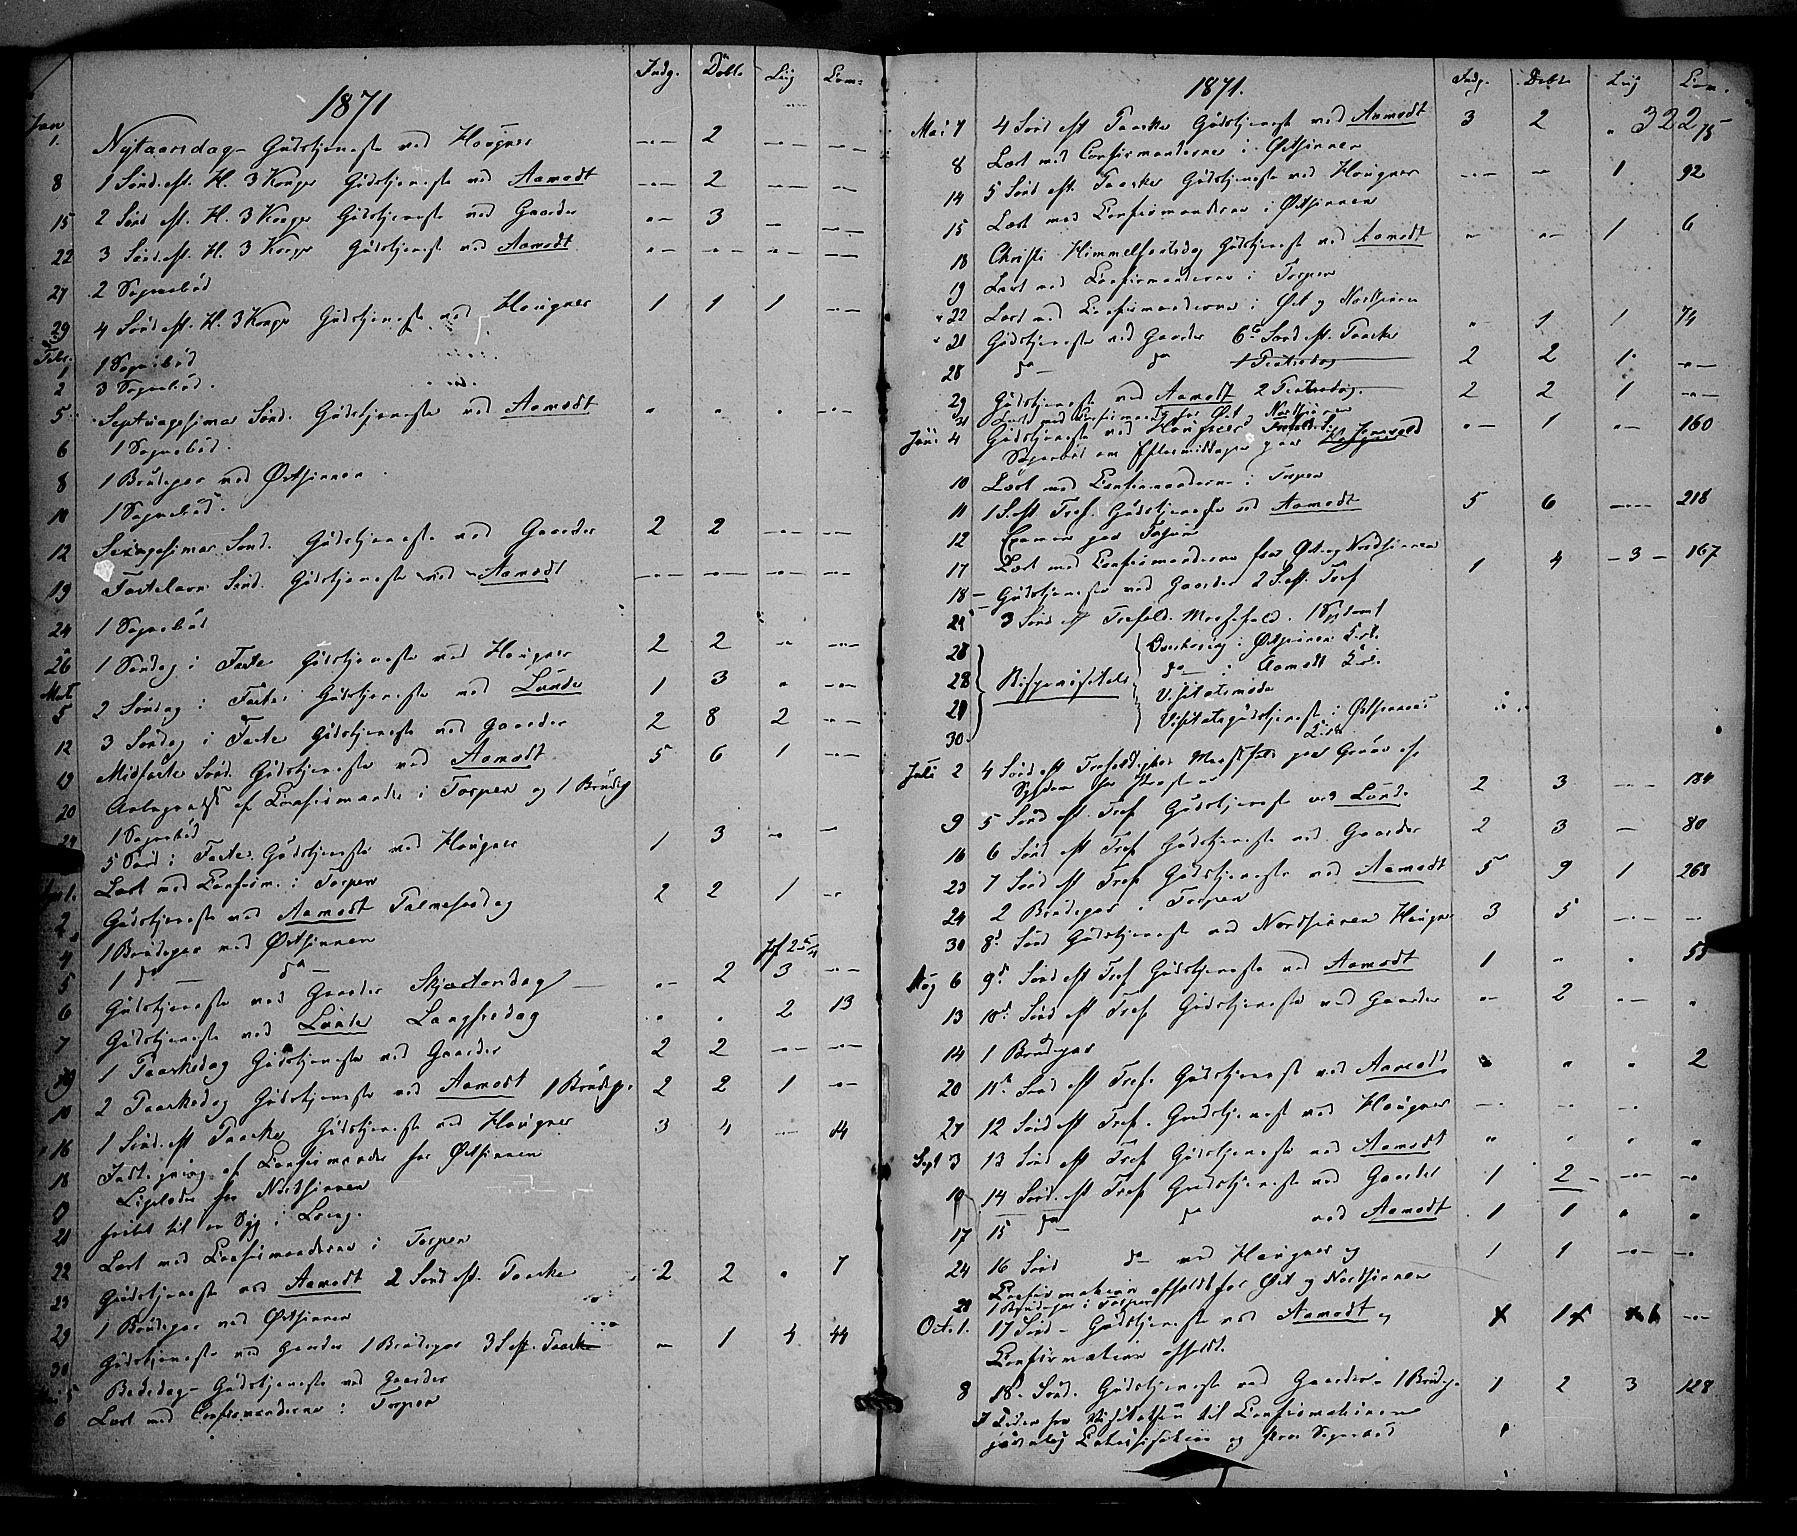 SAH, Nordre Land prestekontor, Ministerialbok nr. 1, 1860-1871, s. 322